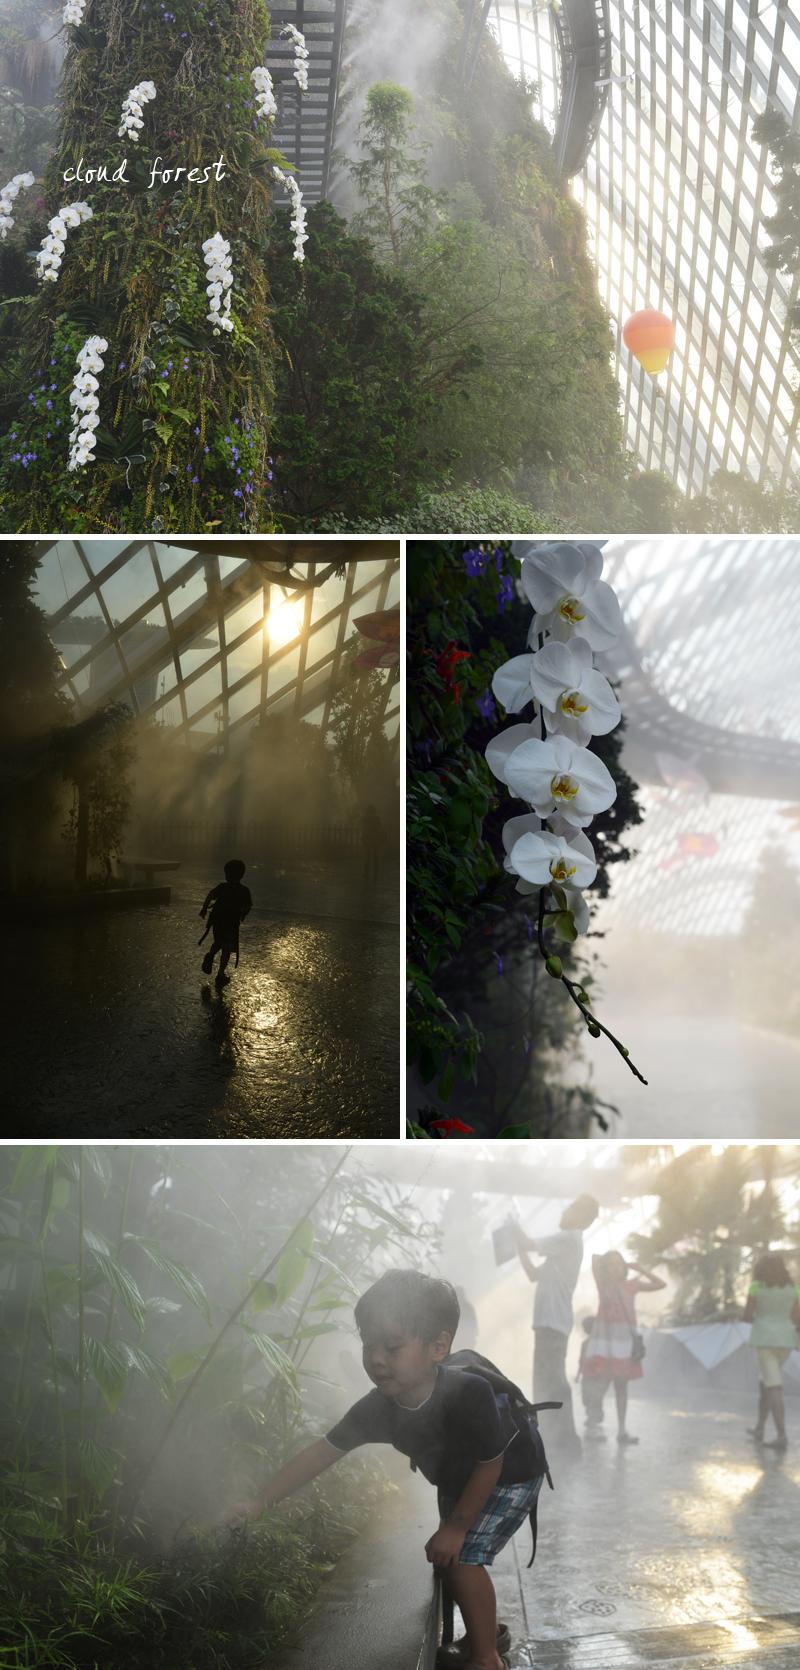 cloud forest | scissors paper stone blog